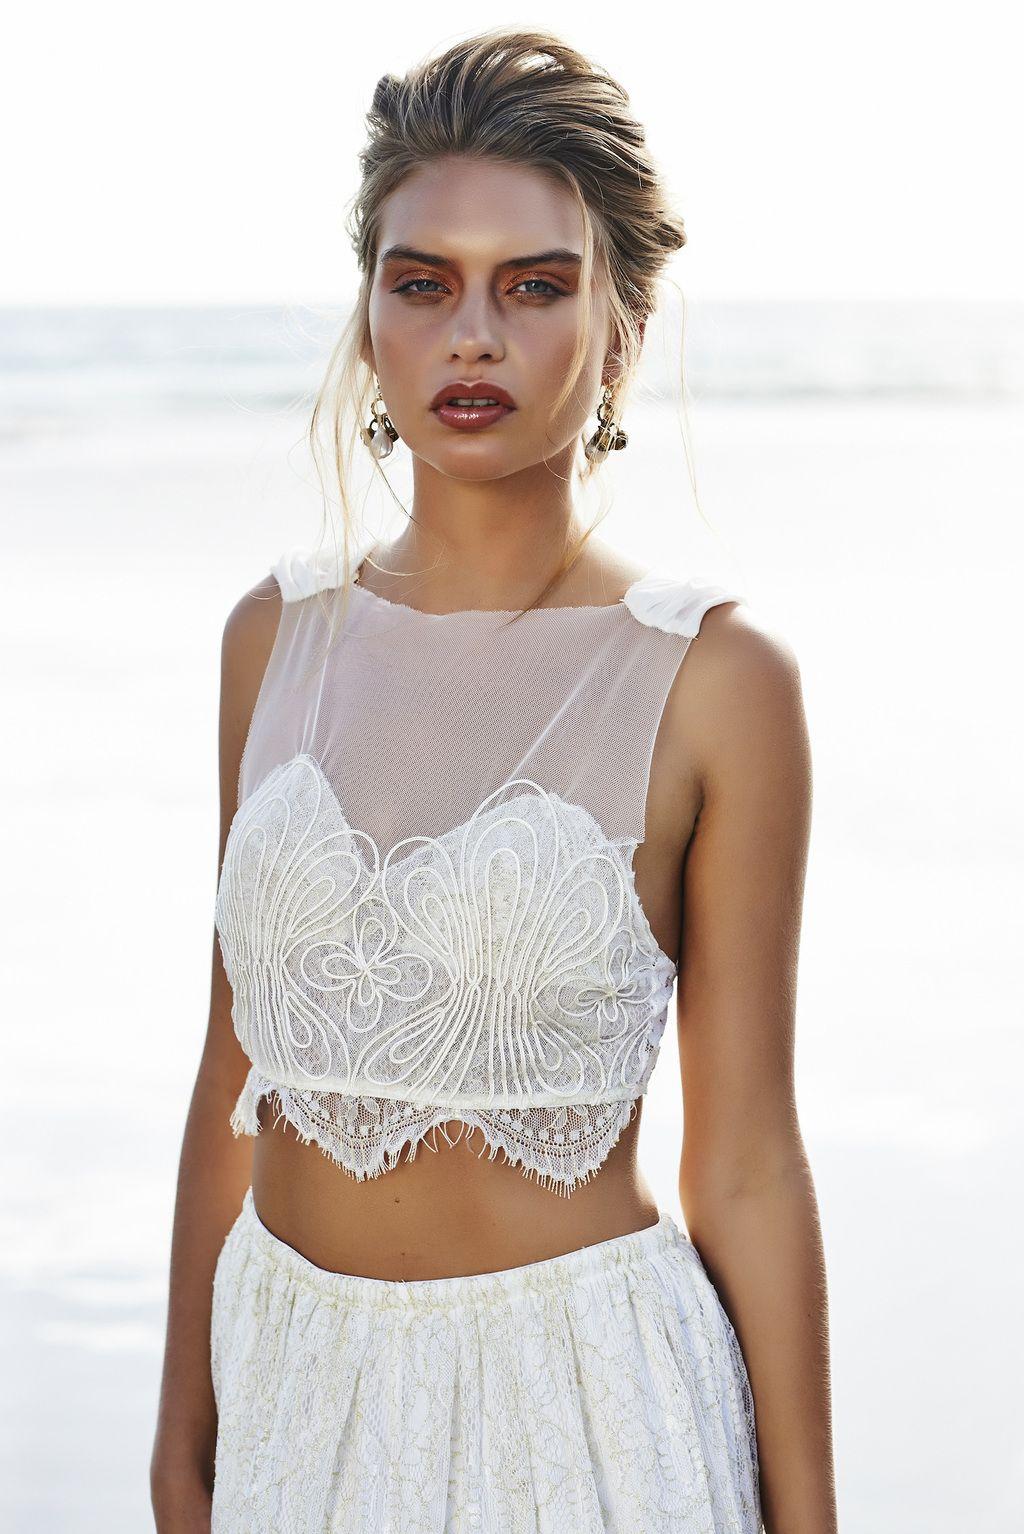 Wedding dresses for a beach wedding  Graceloveslaceavrilweddingdresscloseupfull  wedding